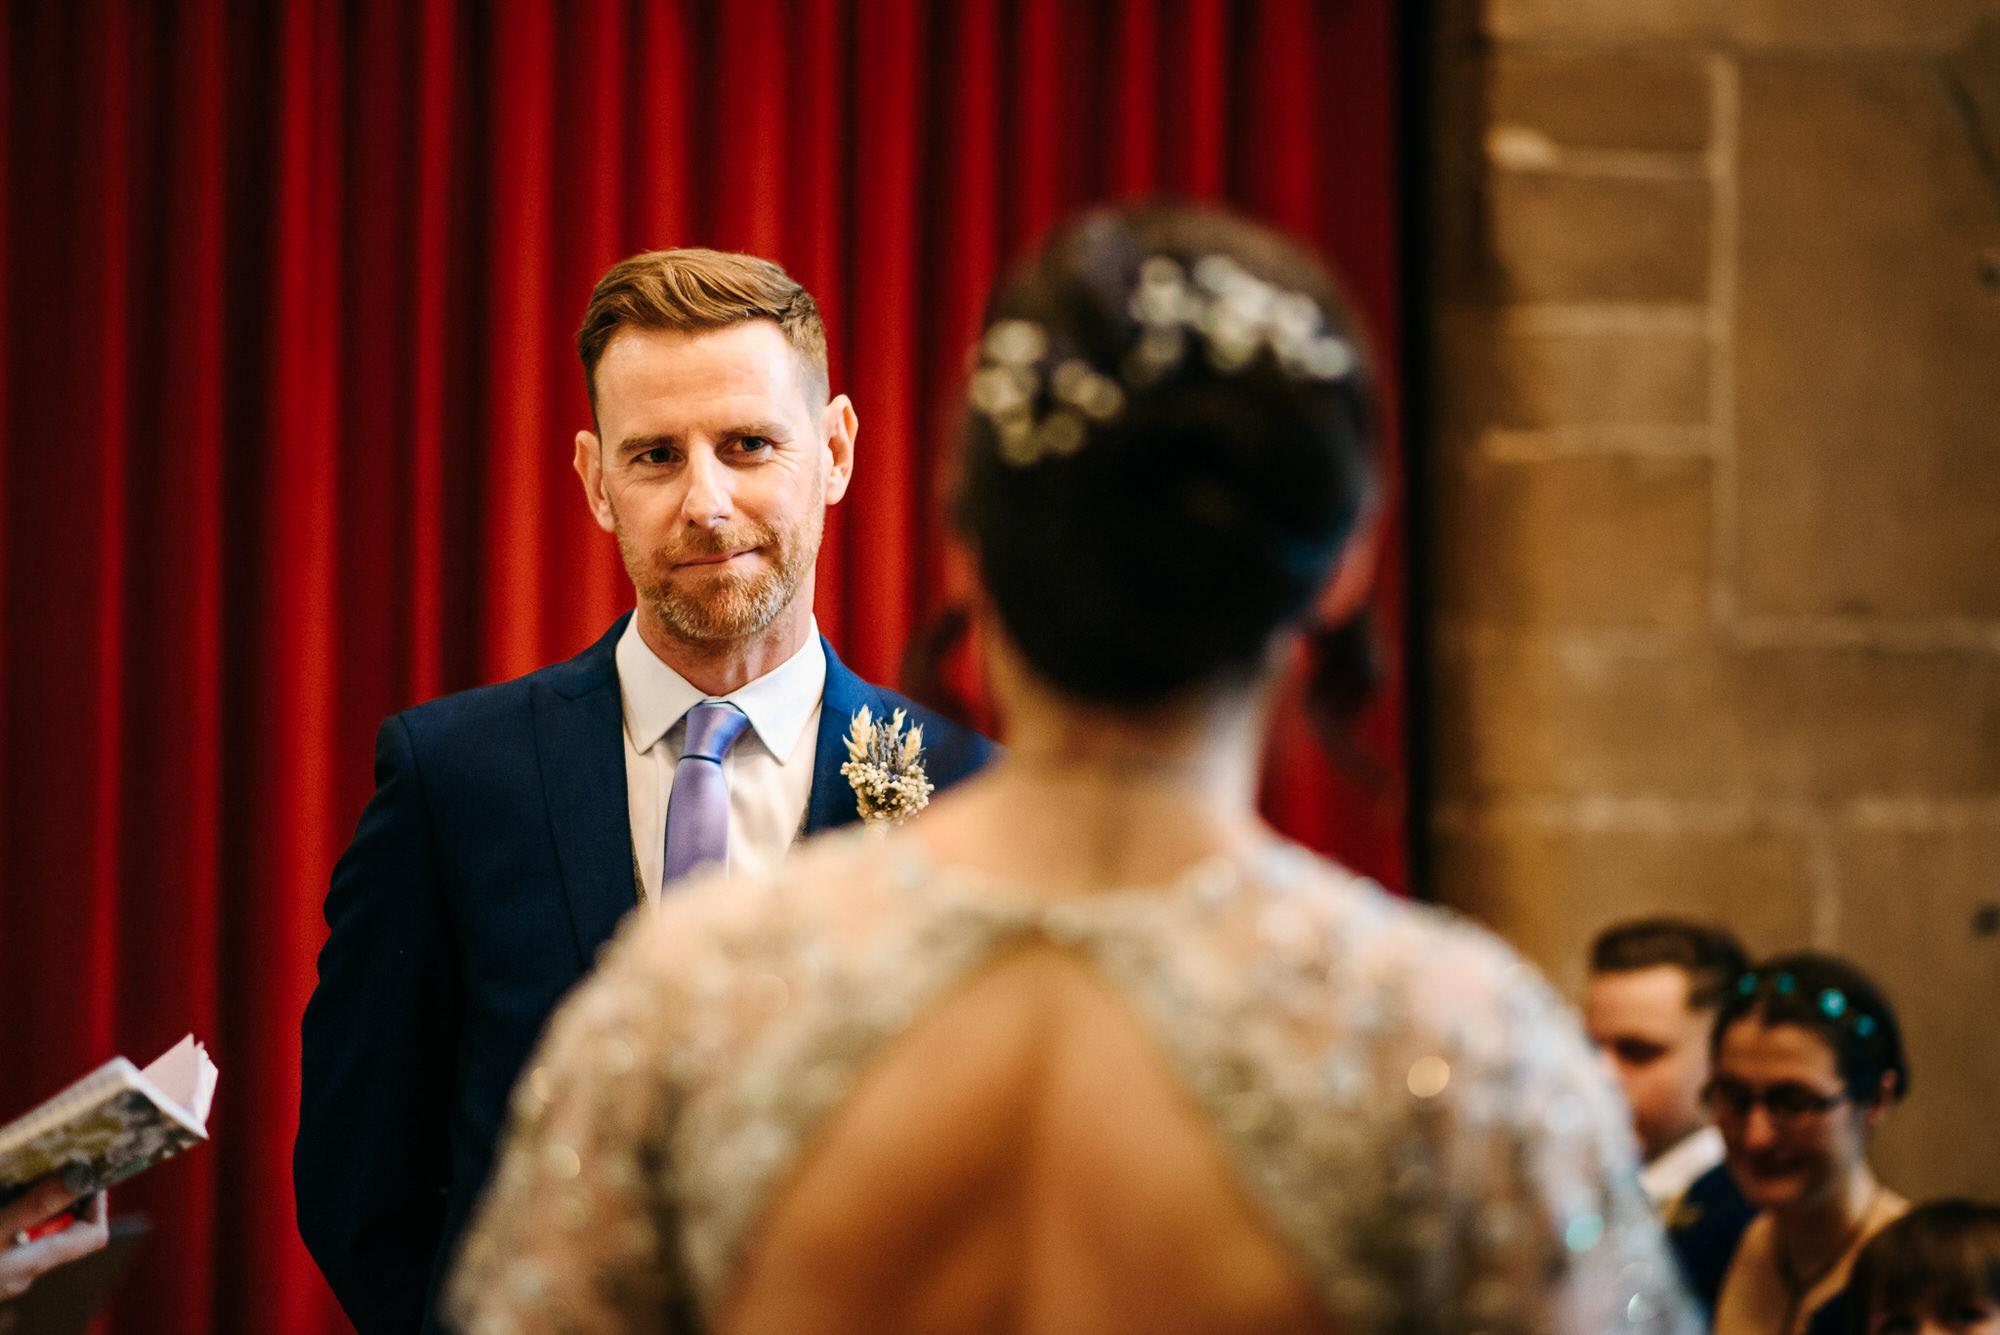 Best Of Yorkshire Wedding Photography 2017 - Martyn Hand-24.jpg